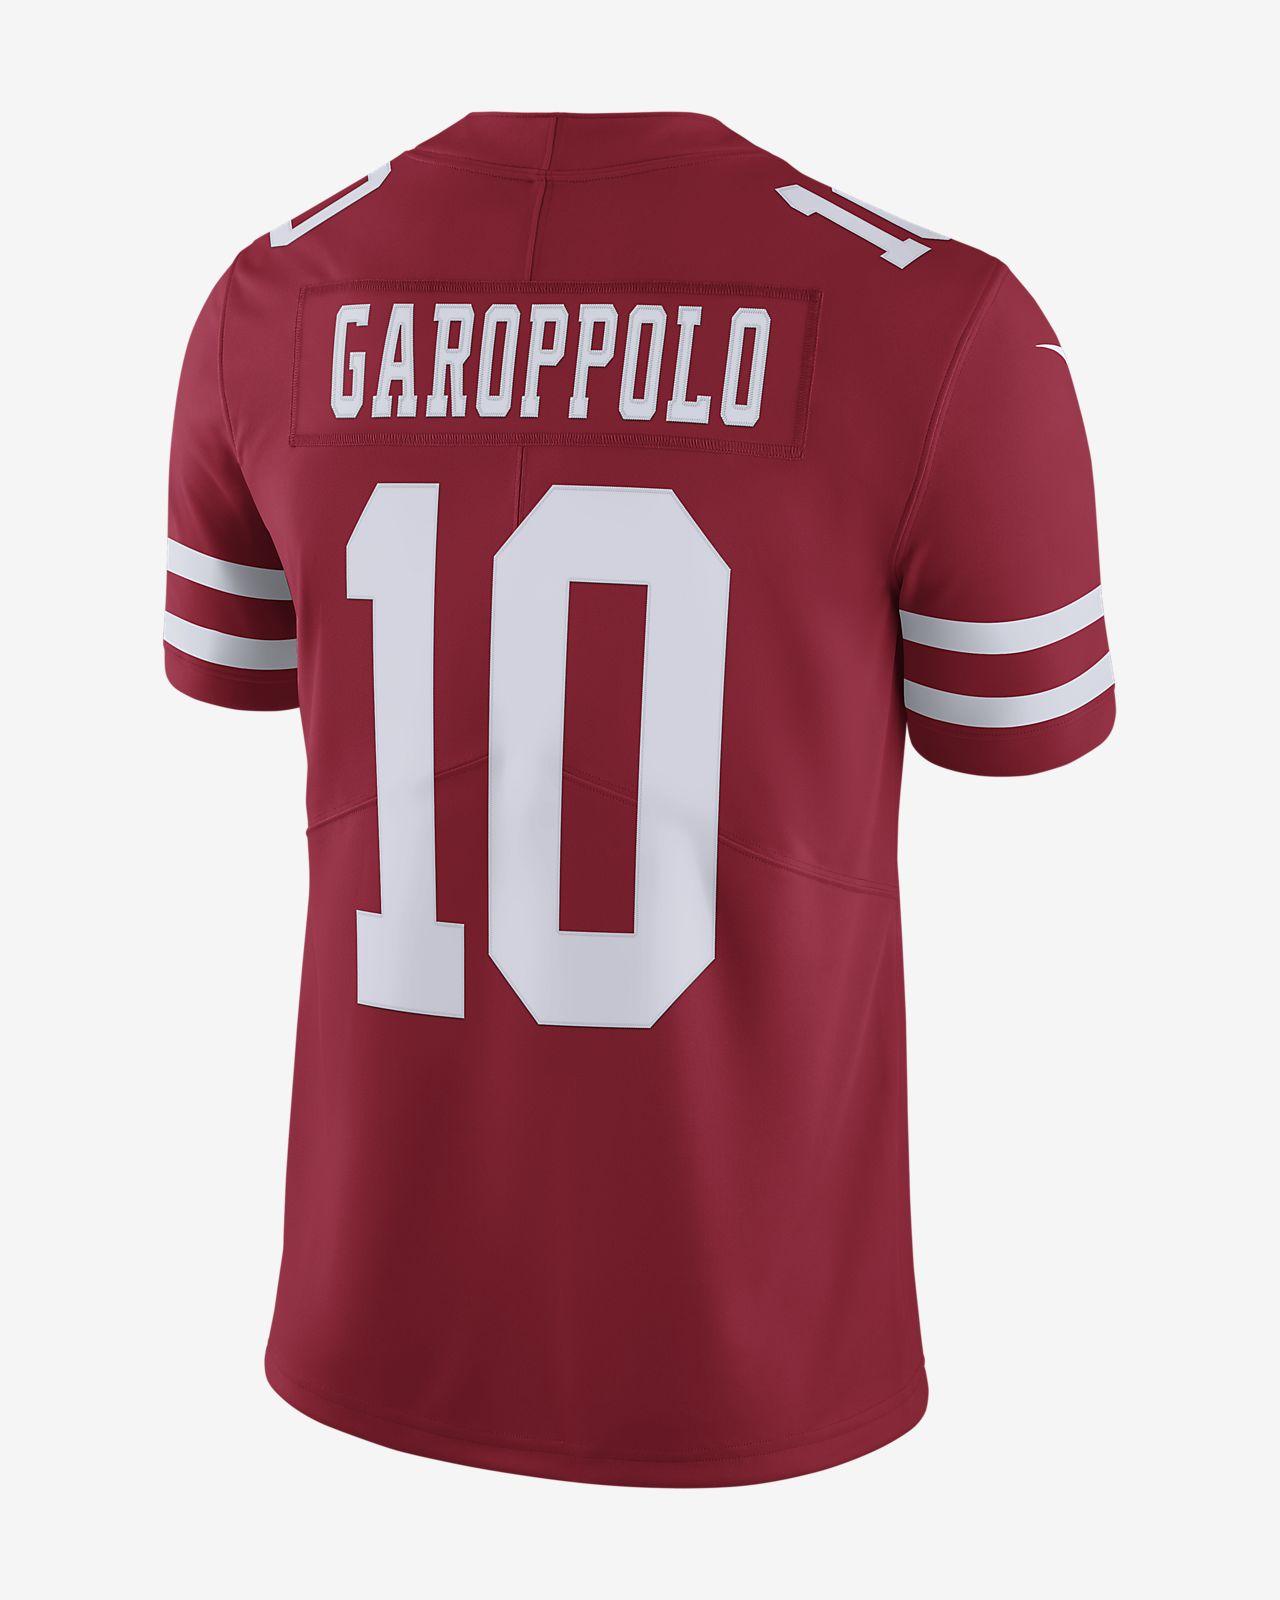 1ef457937 ... NFL San Francisco 49ers Limited (Jimmy Garoppolo) Men s Football Jersey